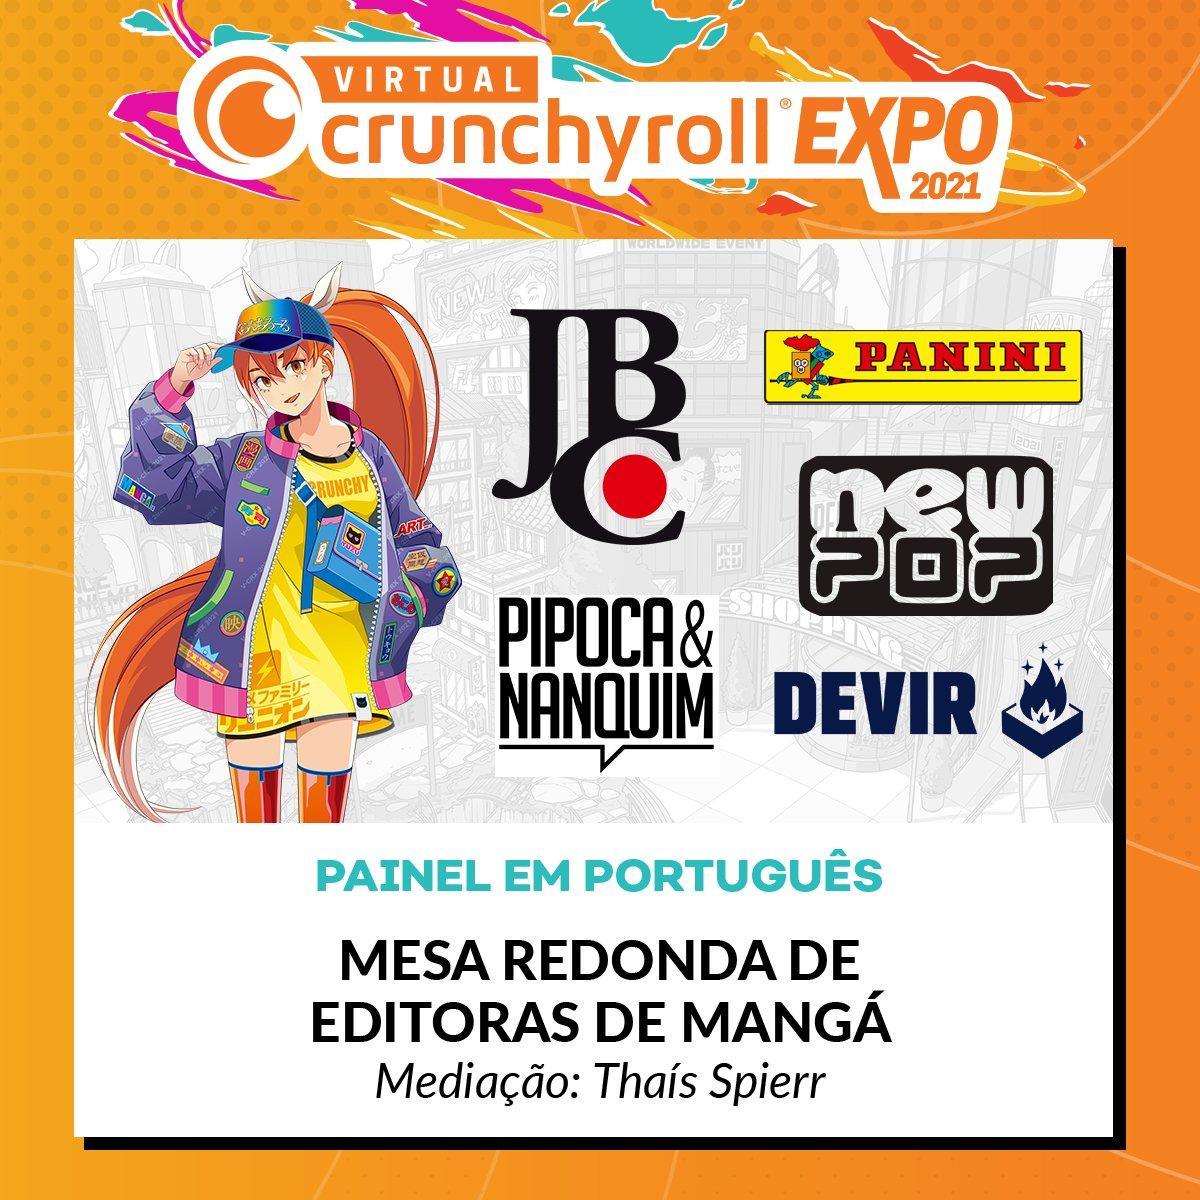 E7UL7vNXMAUxsHn?format=jpg&name=medium - Crunchyroll anuncia painéis para o público brasileiro no Virtual Crunchyroll Expo